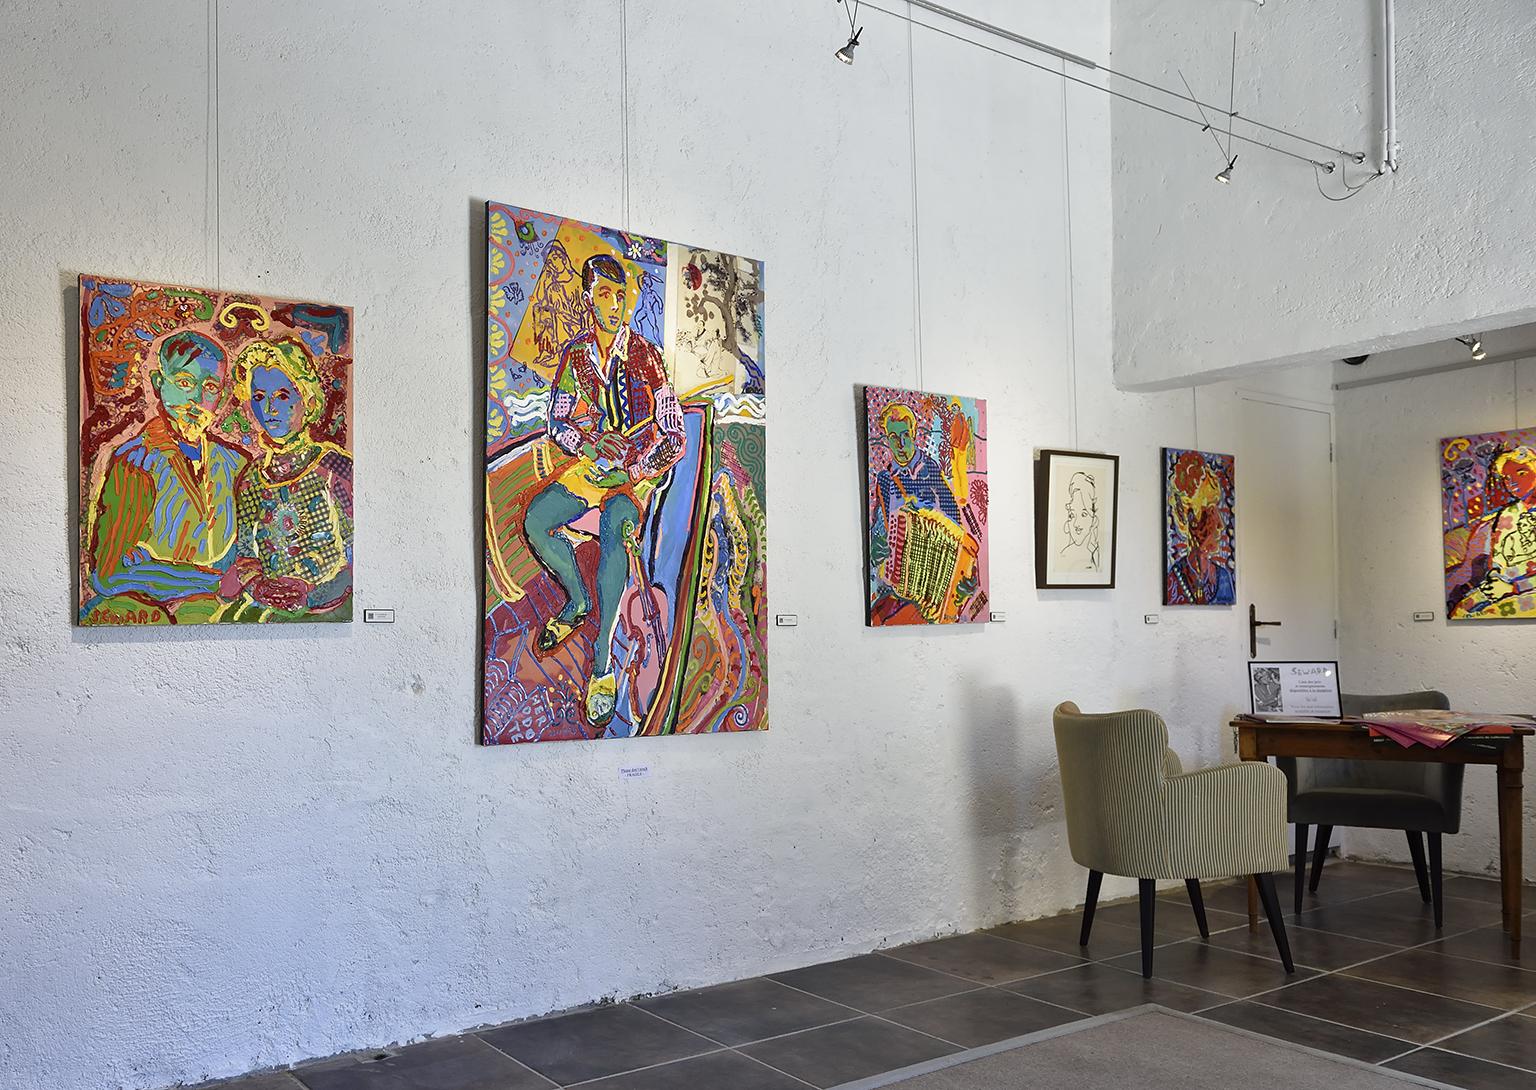 Les peintures de Gordon Seward